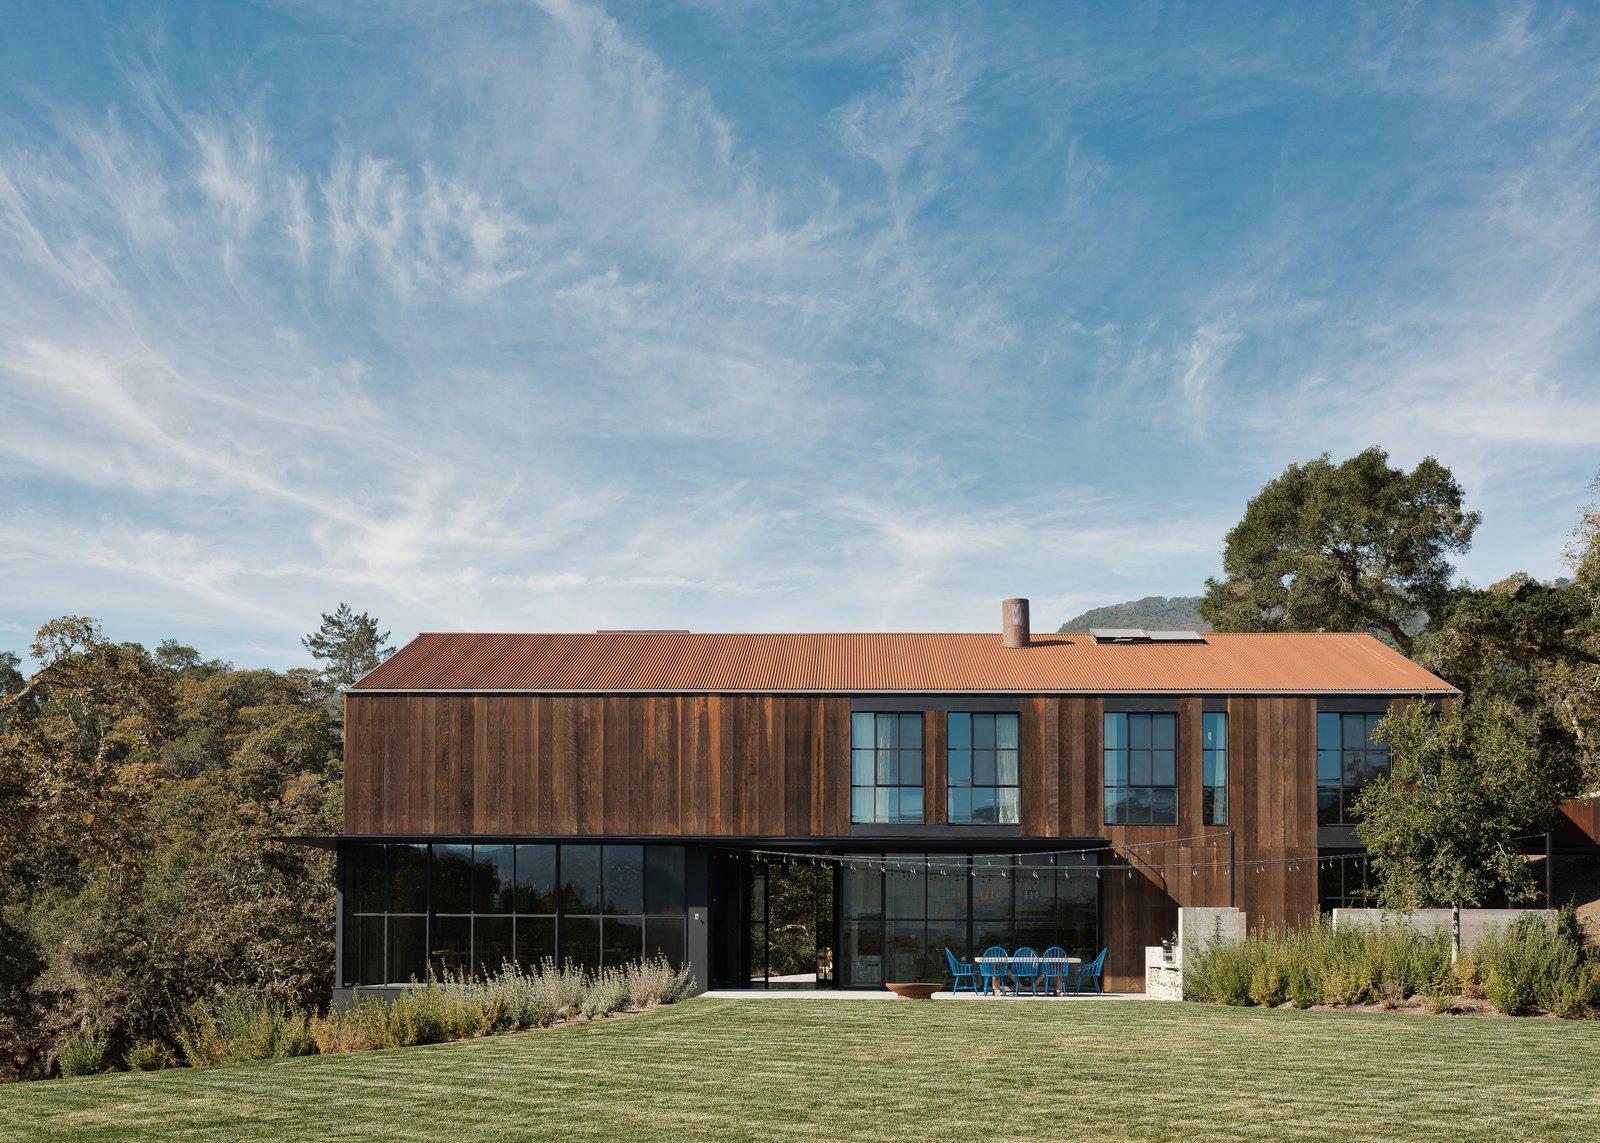 Exterior Big Barn  Big Barn by Faulkner Architects